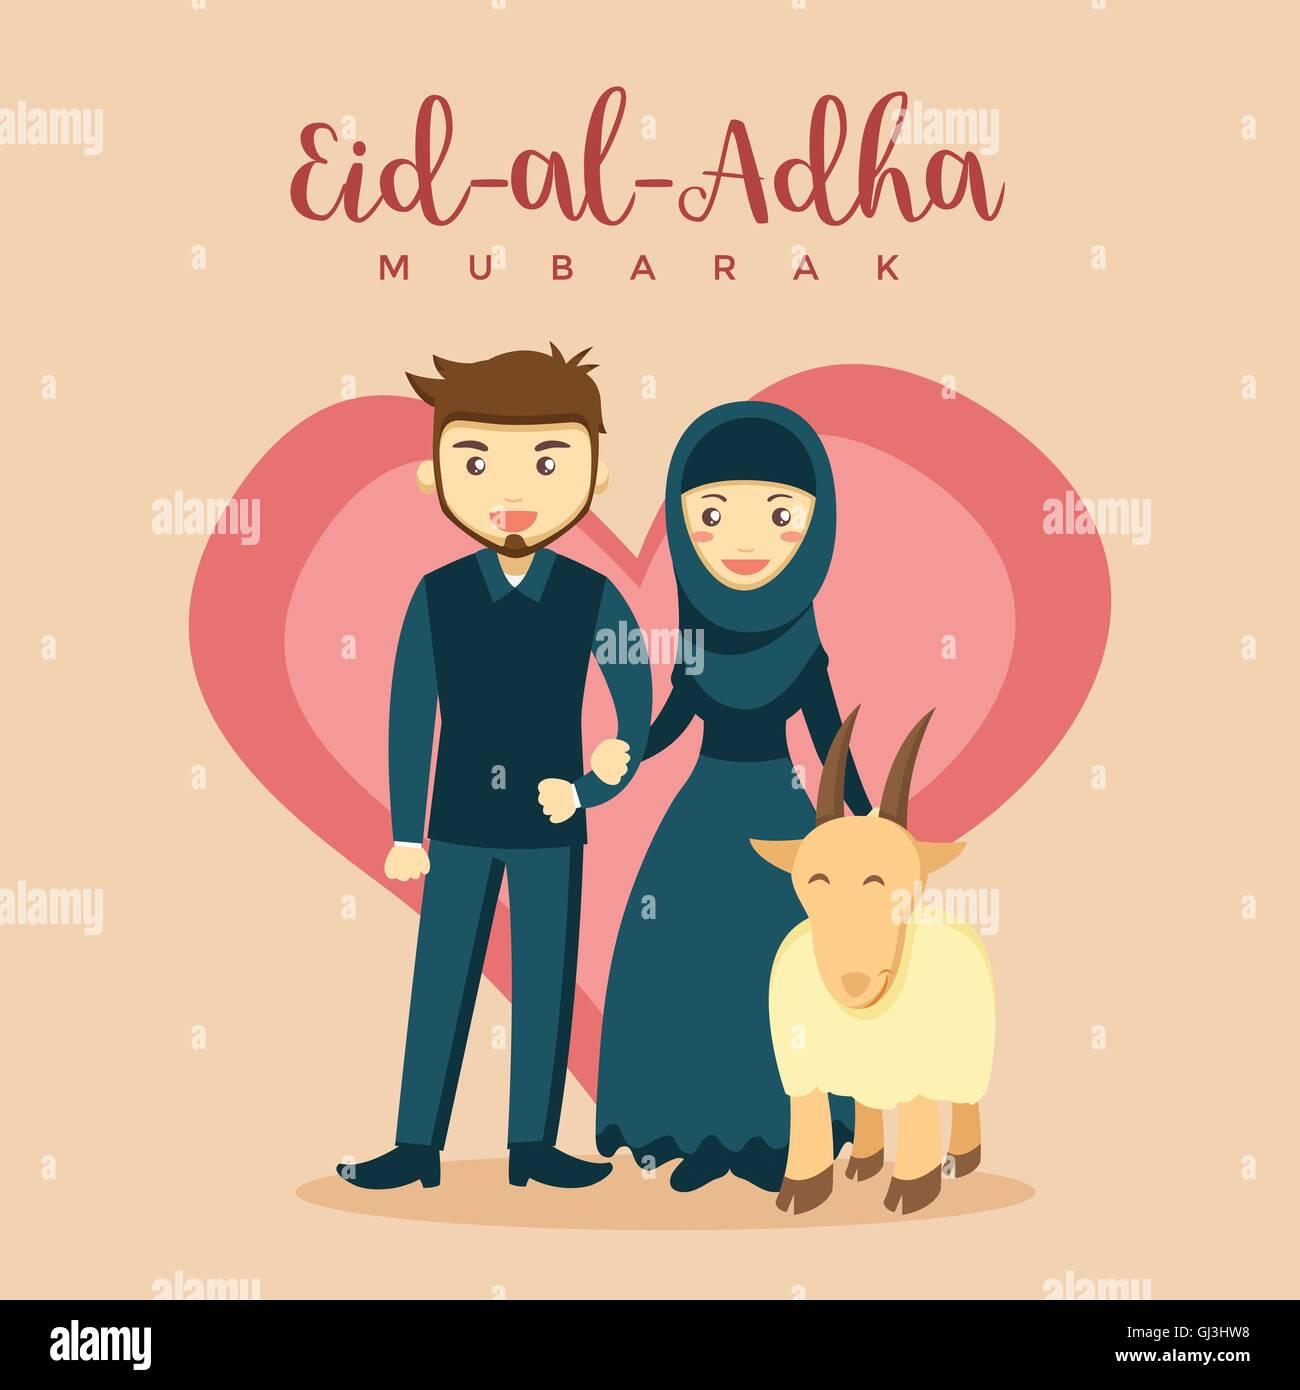 Muslim Couple Eid Al Adha Greeting Card - Love Qurban Stock Vector